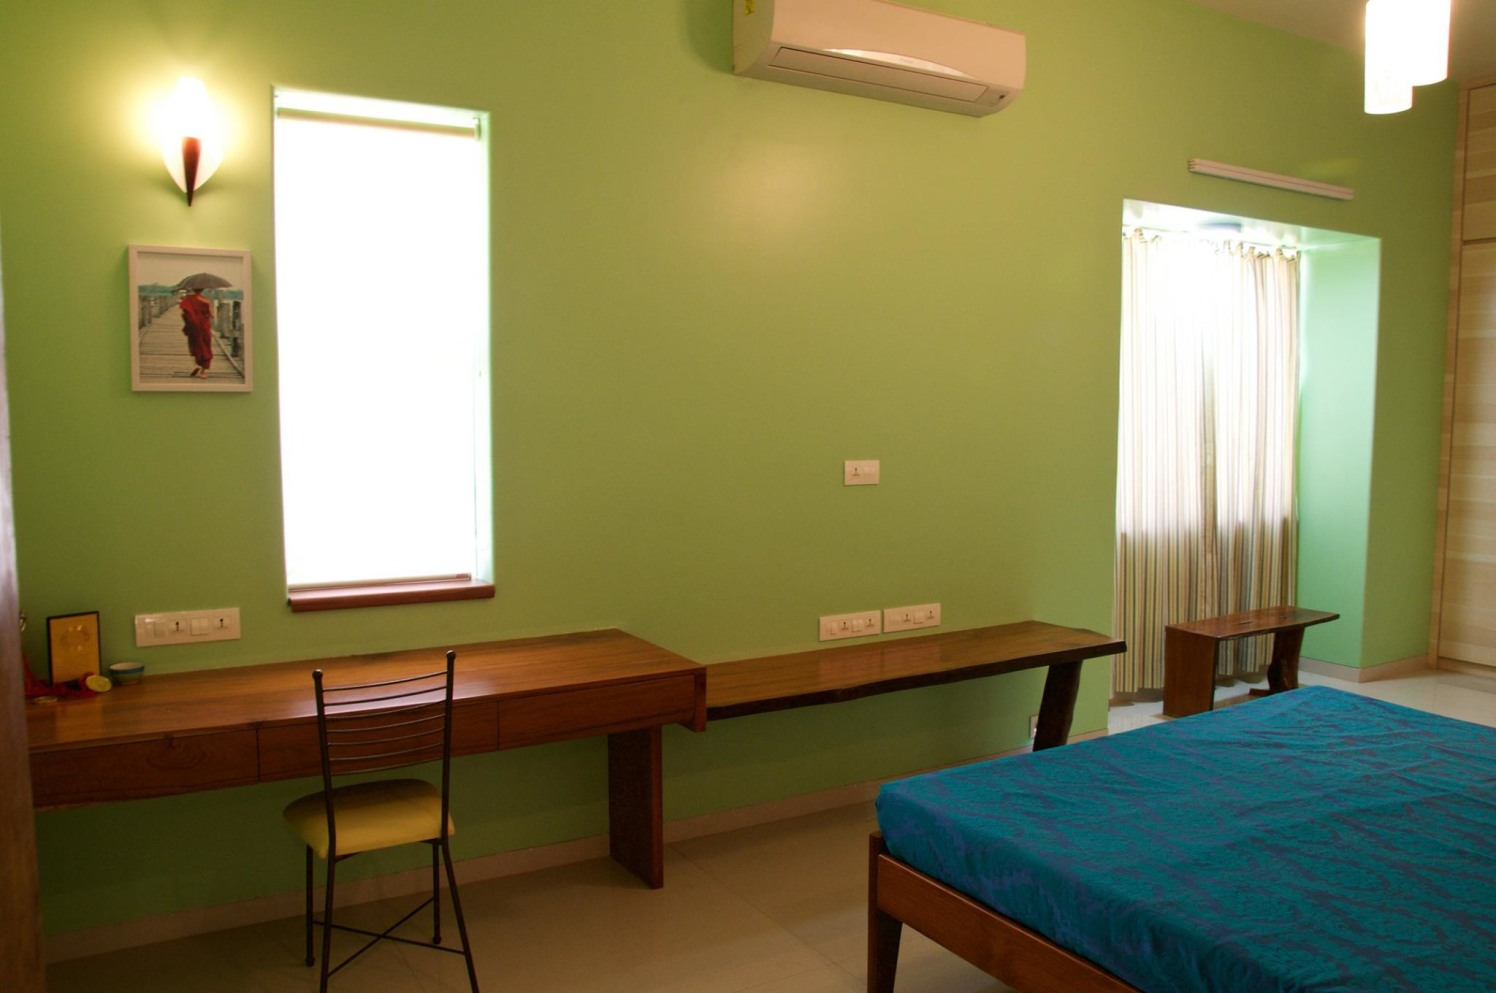 Study Room by Design Kkarma Bedroom Minimalistic | Interior Design Photos & Ideas